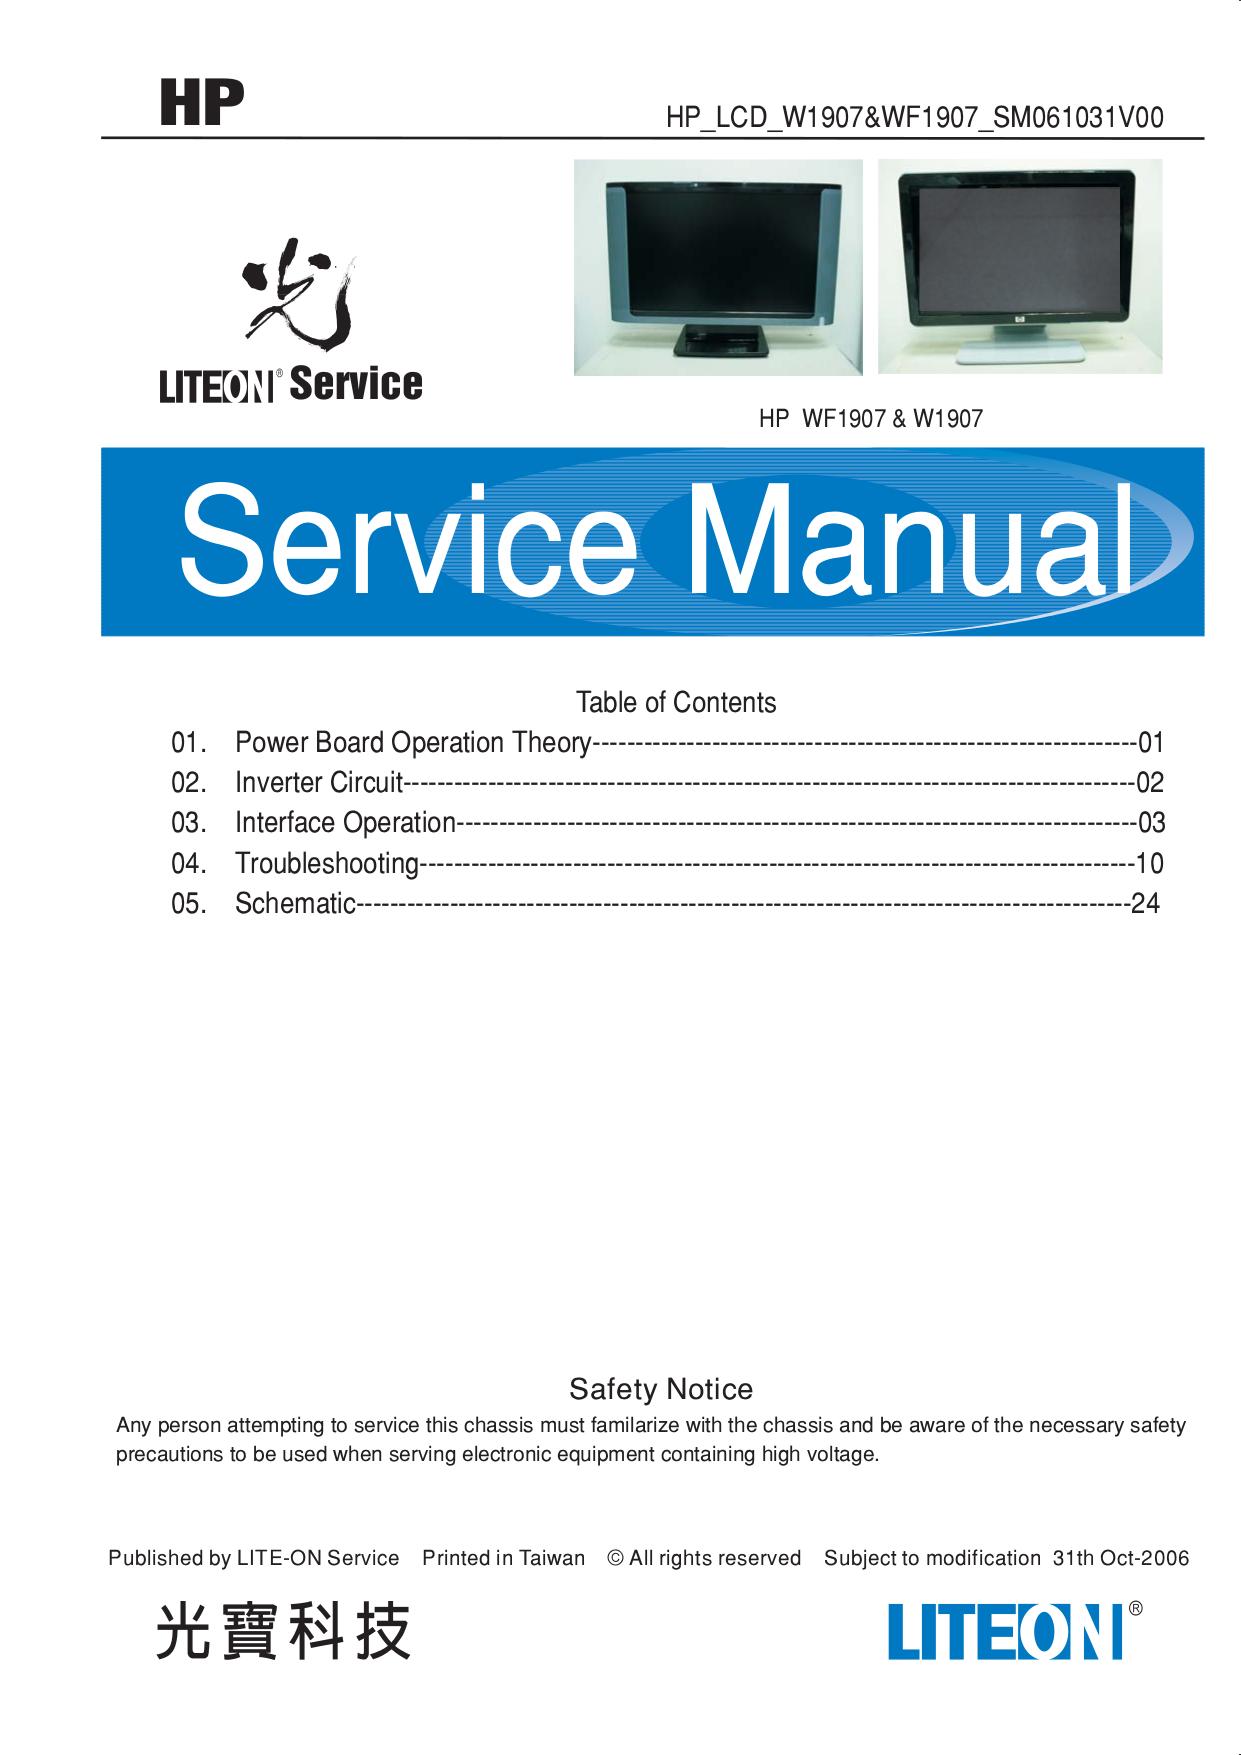 download free pdf for hp w1907 monitor manual rh umlib com HP W1907 Gamong HP W1907 Width